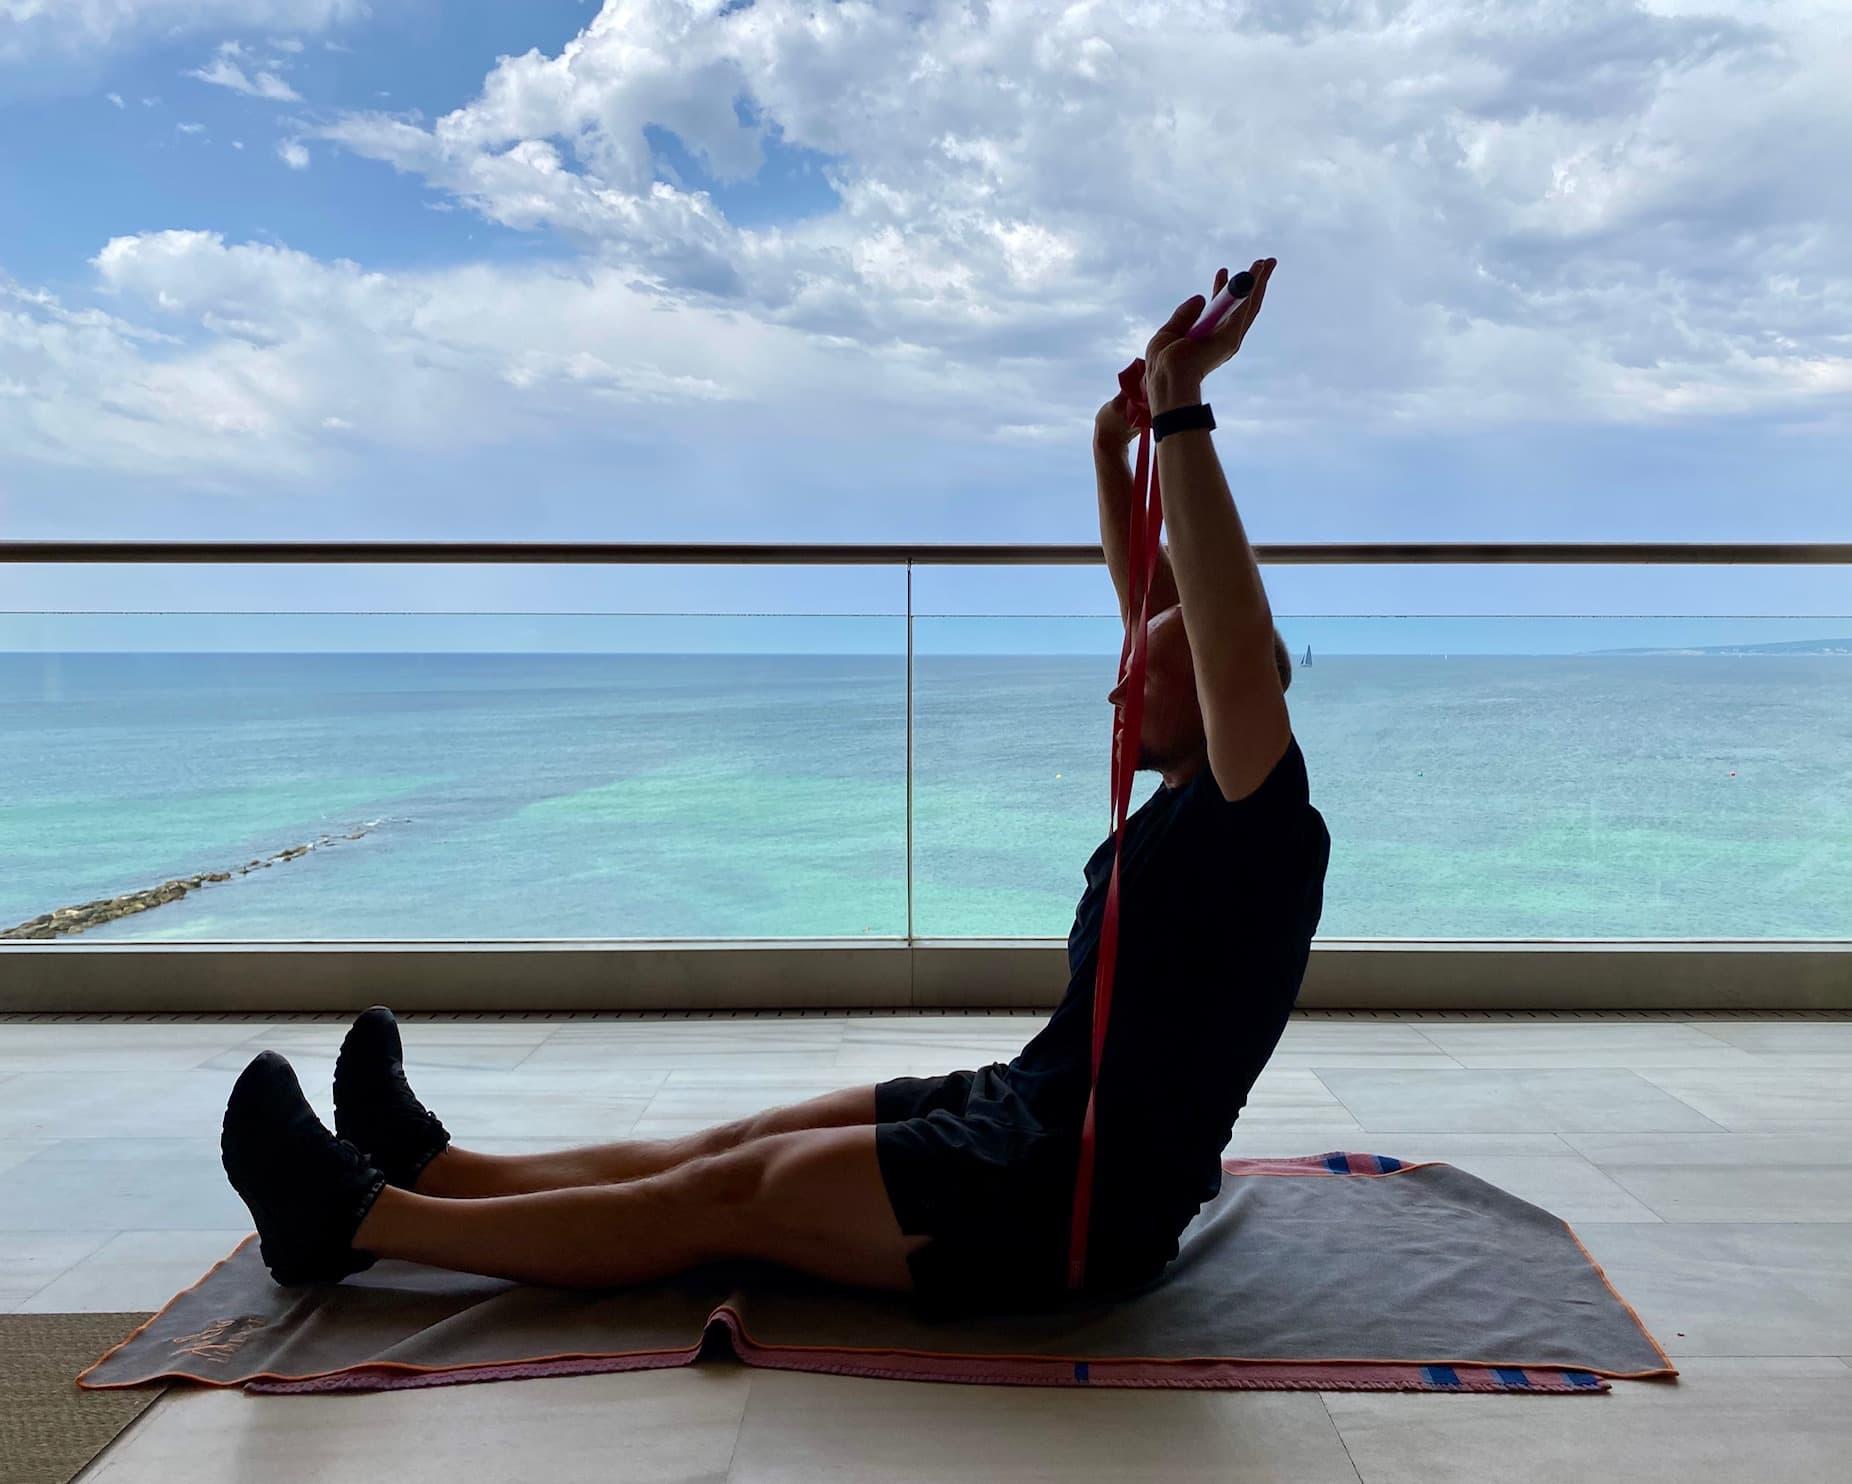 Matt training on the balcony in Spain